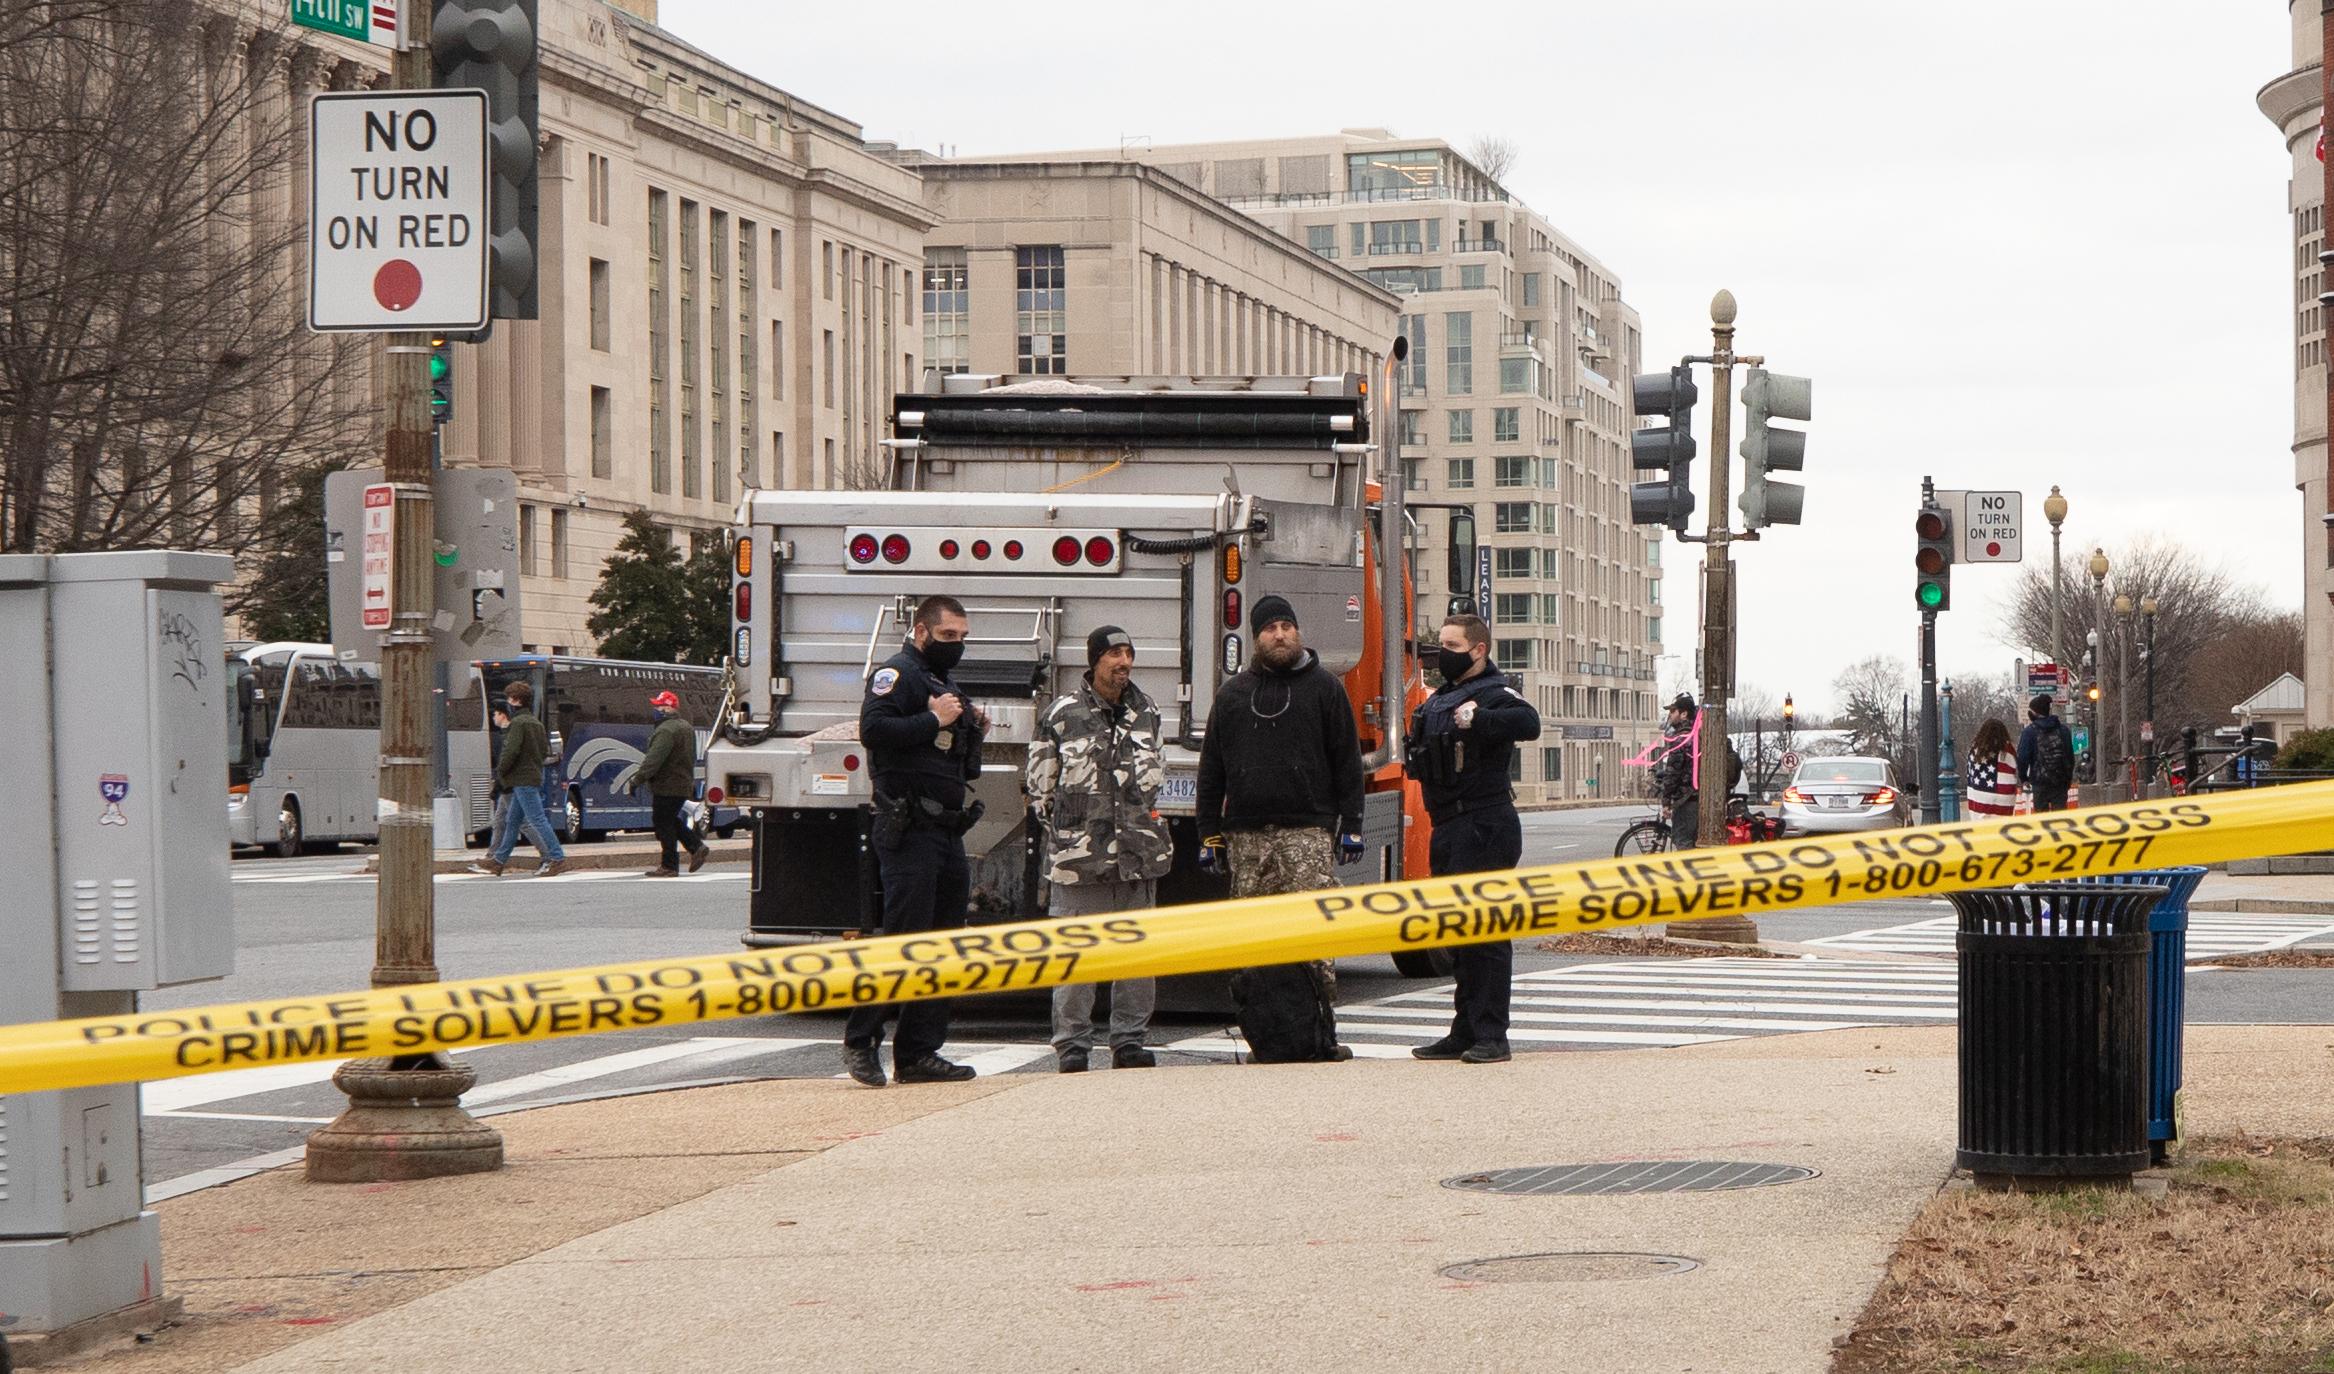 """Big John/Jon"" was arrested for having an AR-15 ""upper"" in Washington, D.C. on Jan. 6, 2021. (Kaylee Greenlee – Daily Caller News Foundation)"